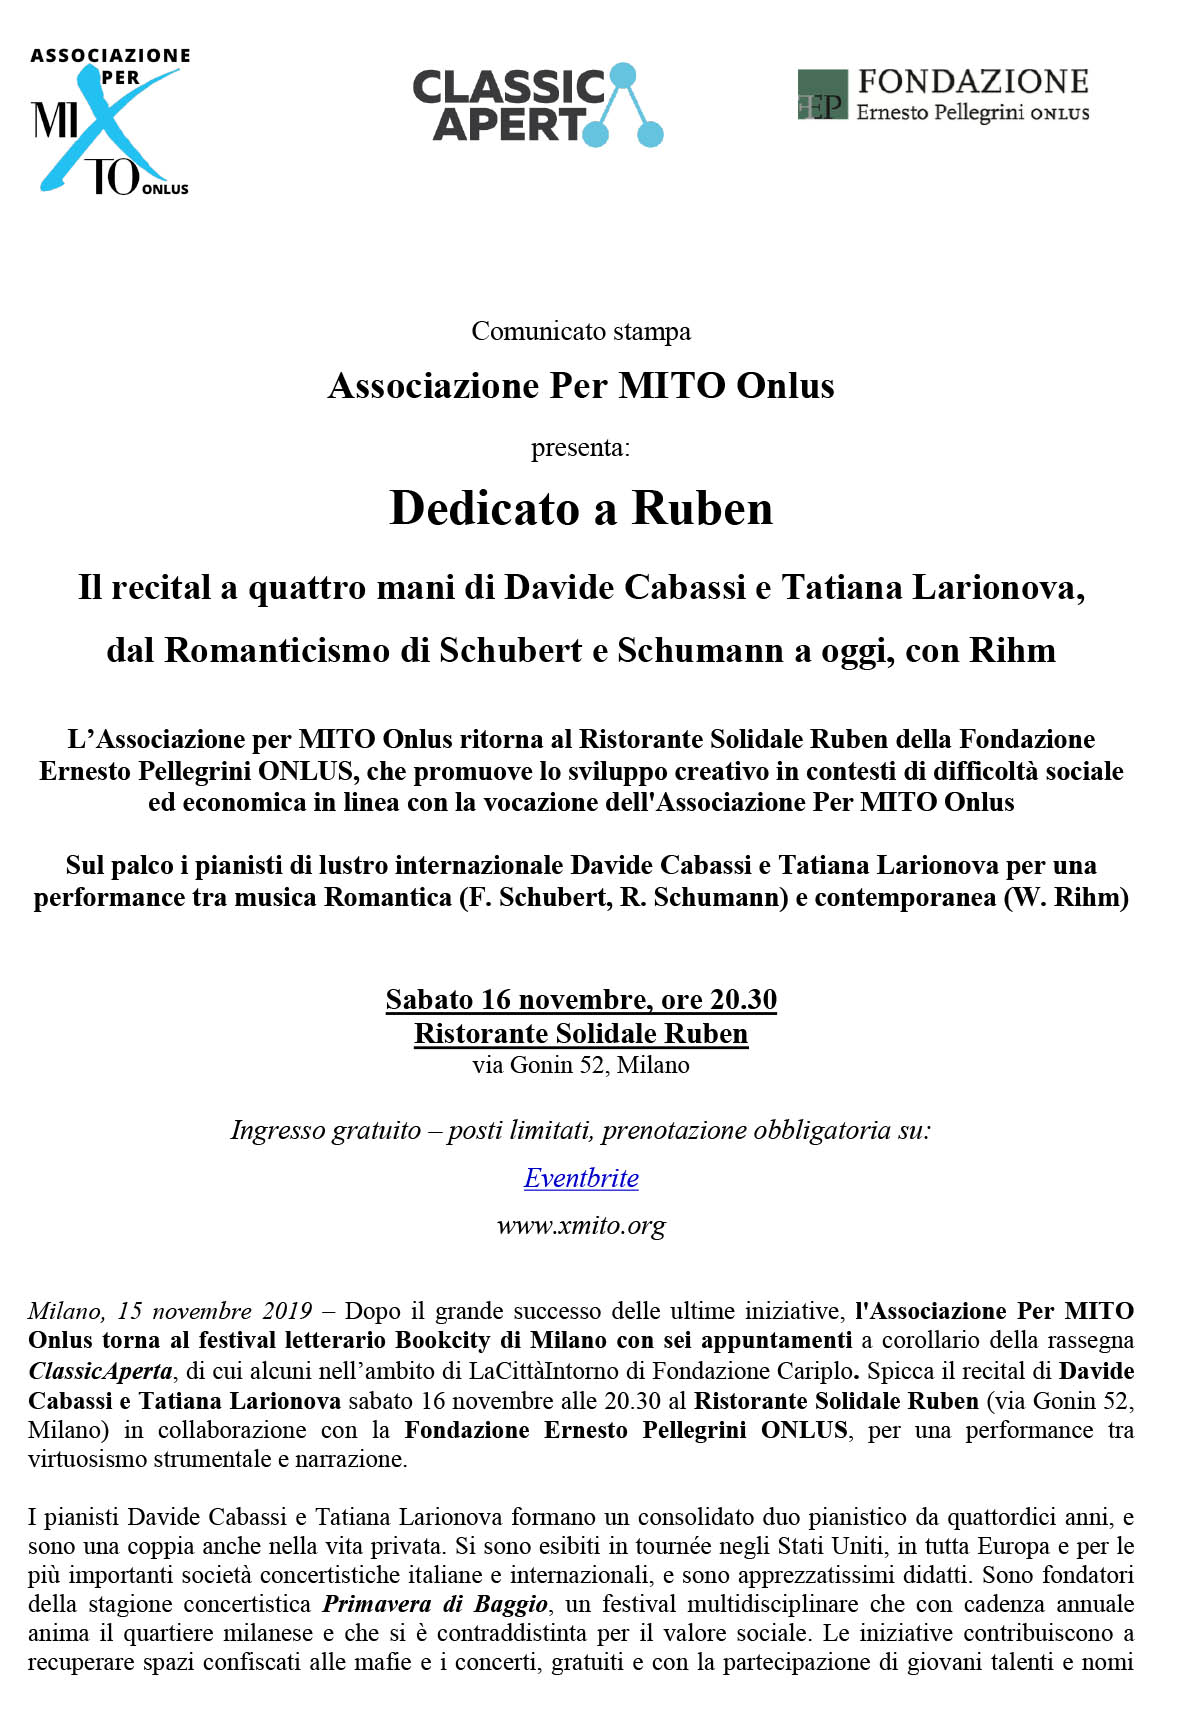 Microsoft Word - CS_Ruben_16.11.29.doc